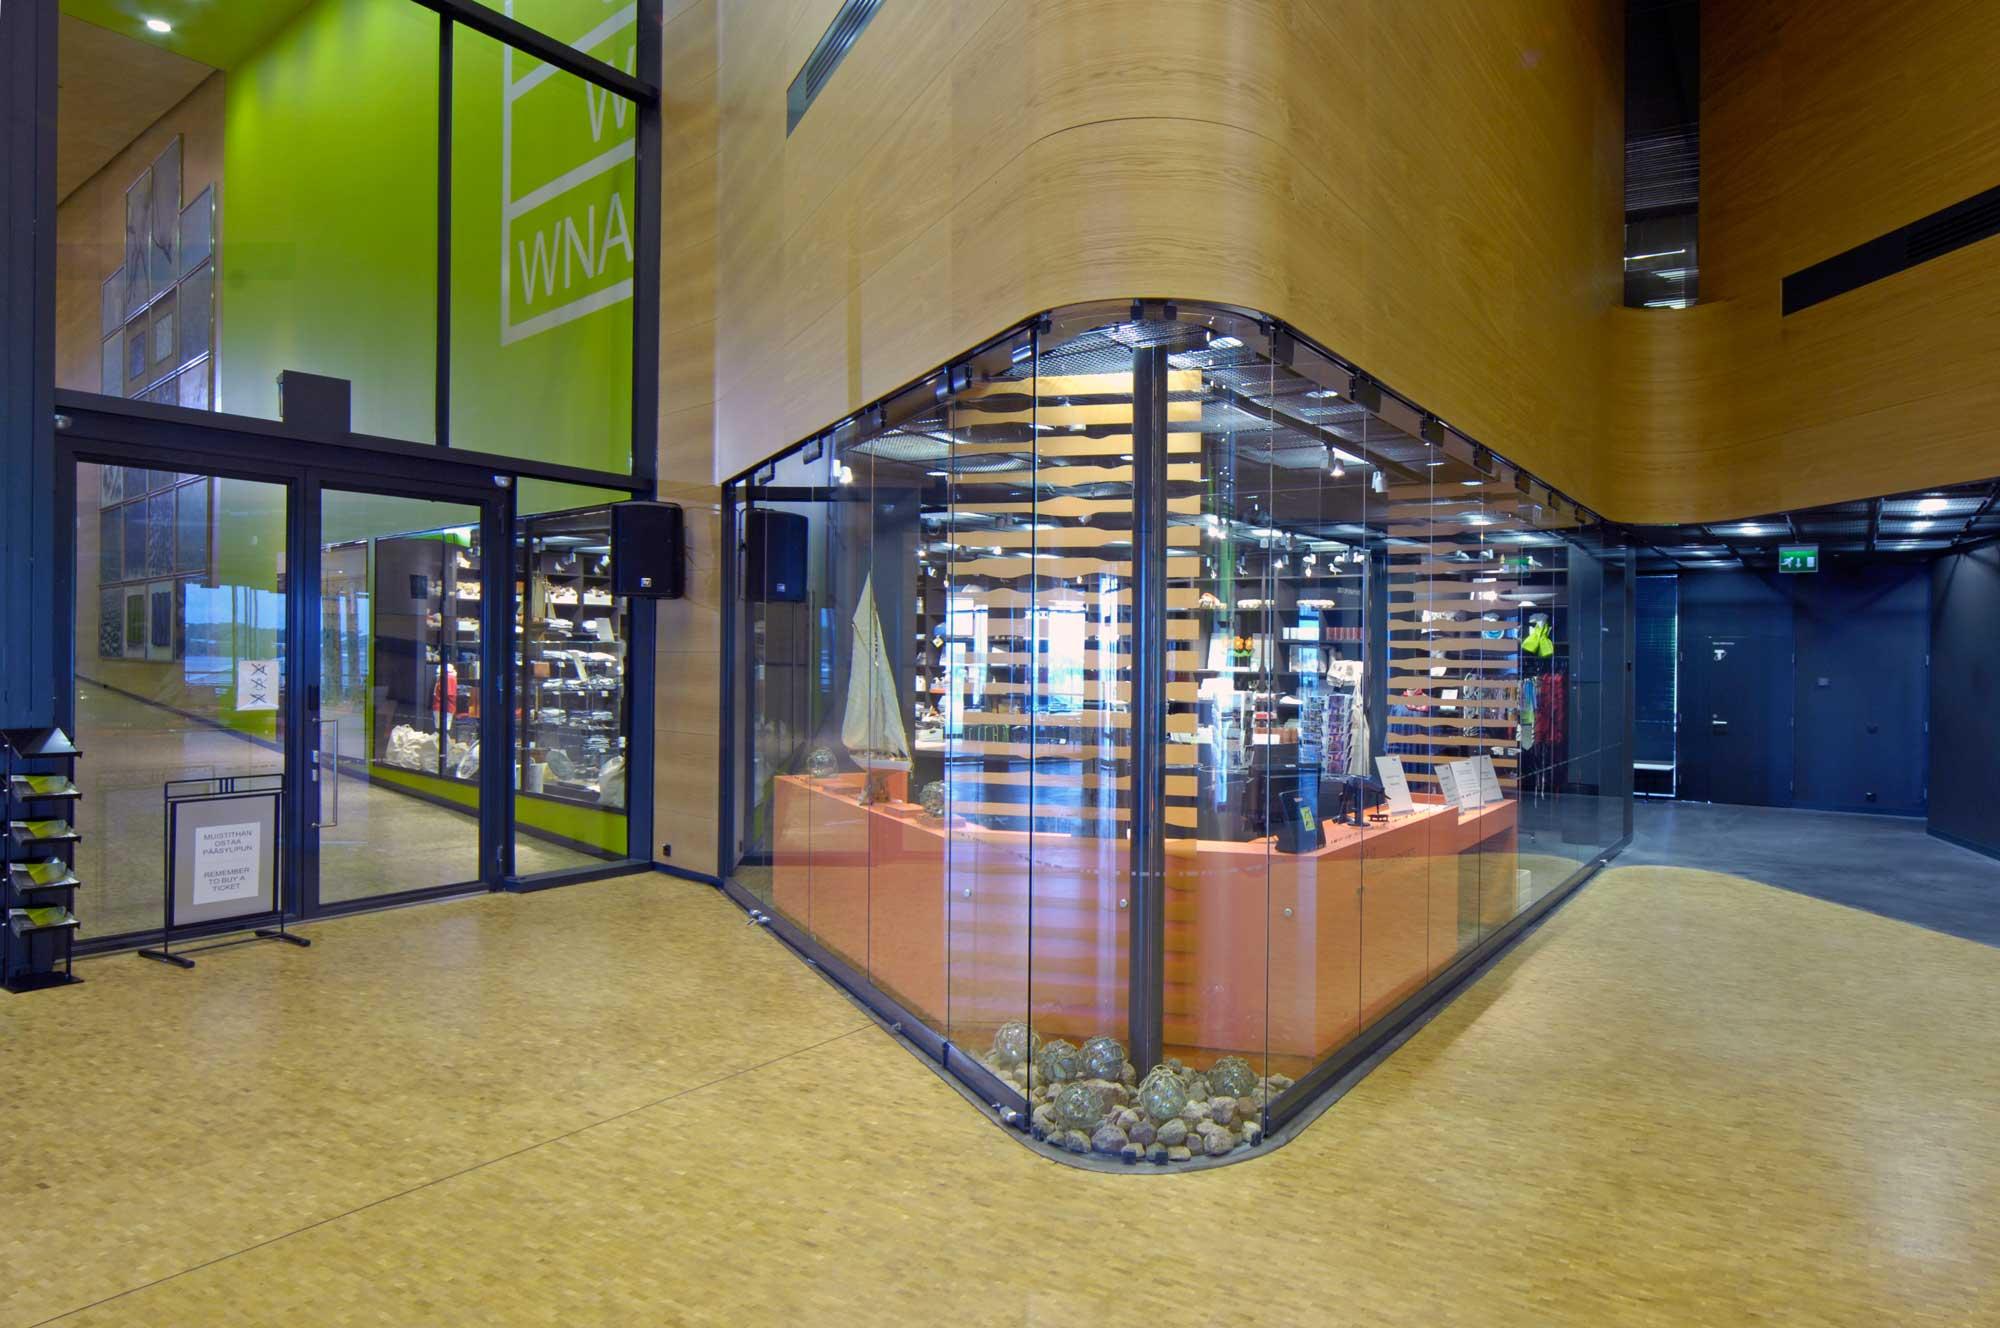 Scanmikael_curved glass walls_Vellamo_2